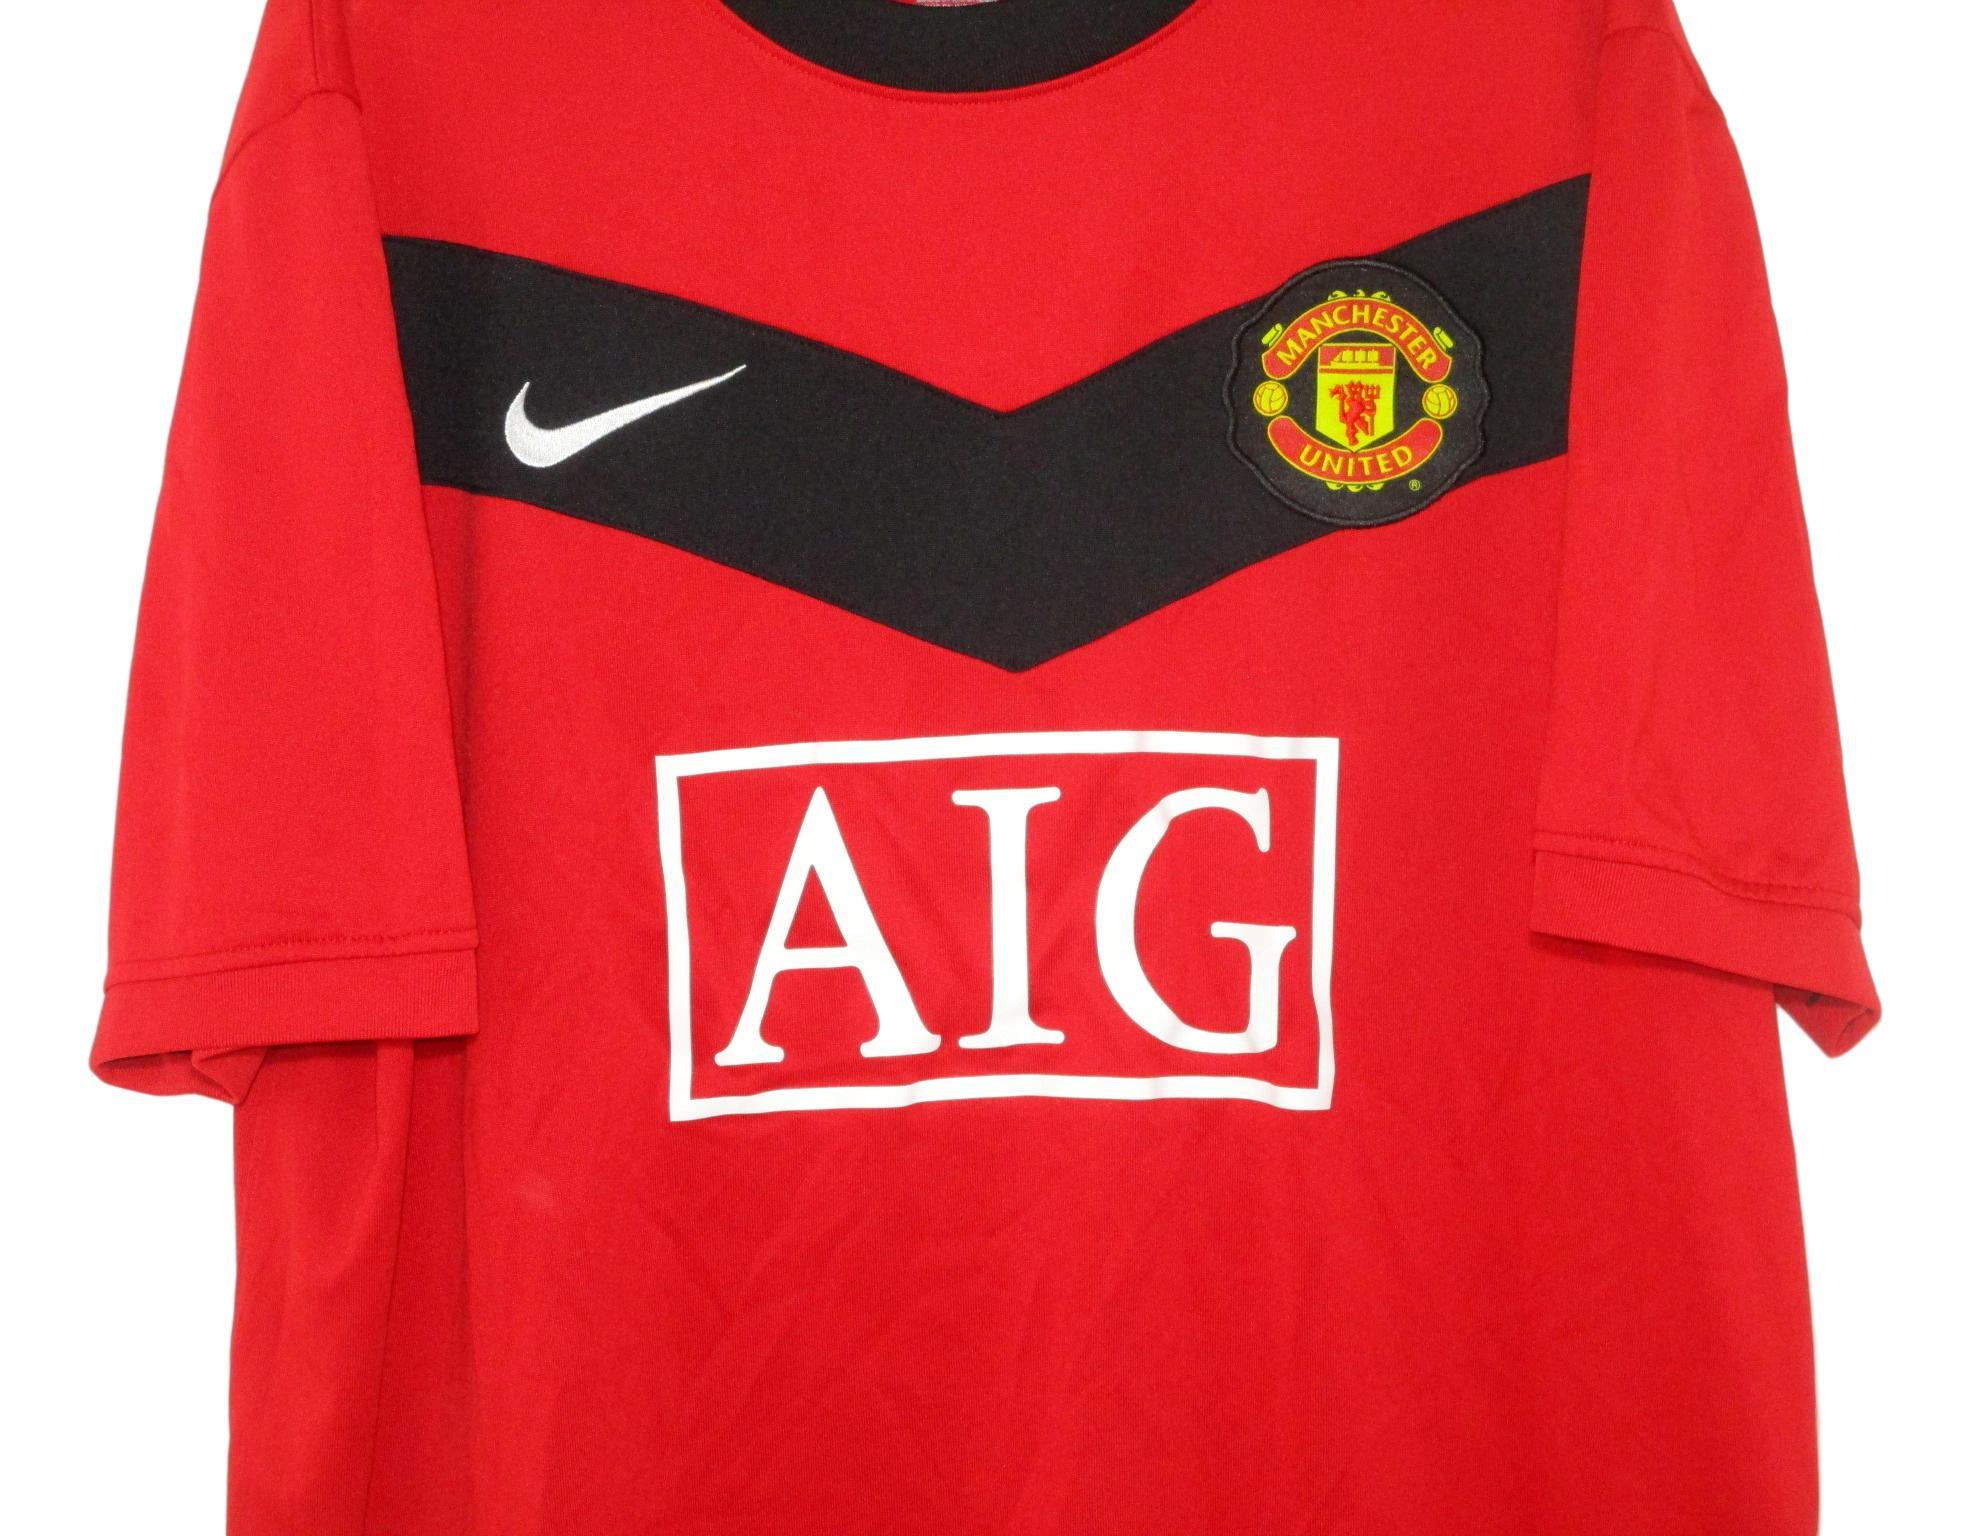 2009-10 Manchester United Home Shirt (XL)   The Kitman Football Shirts